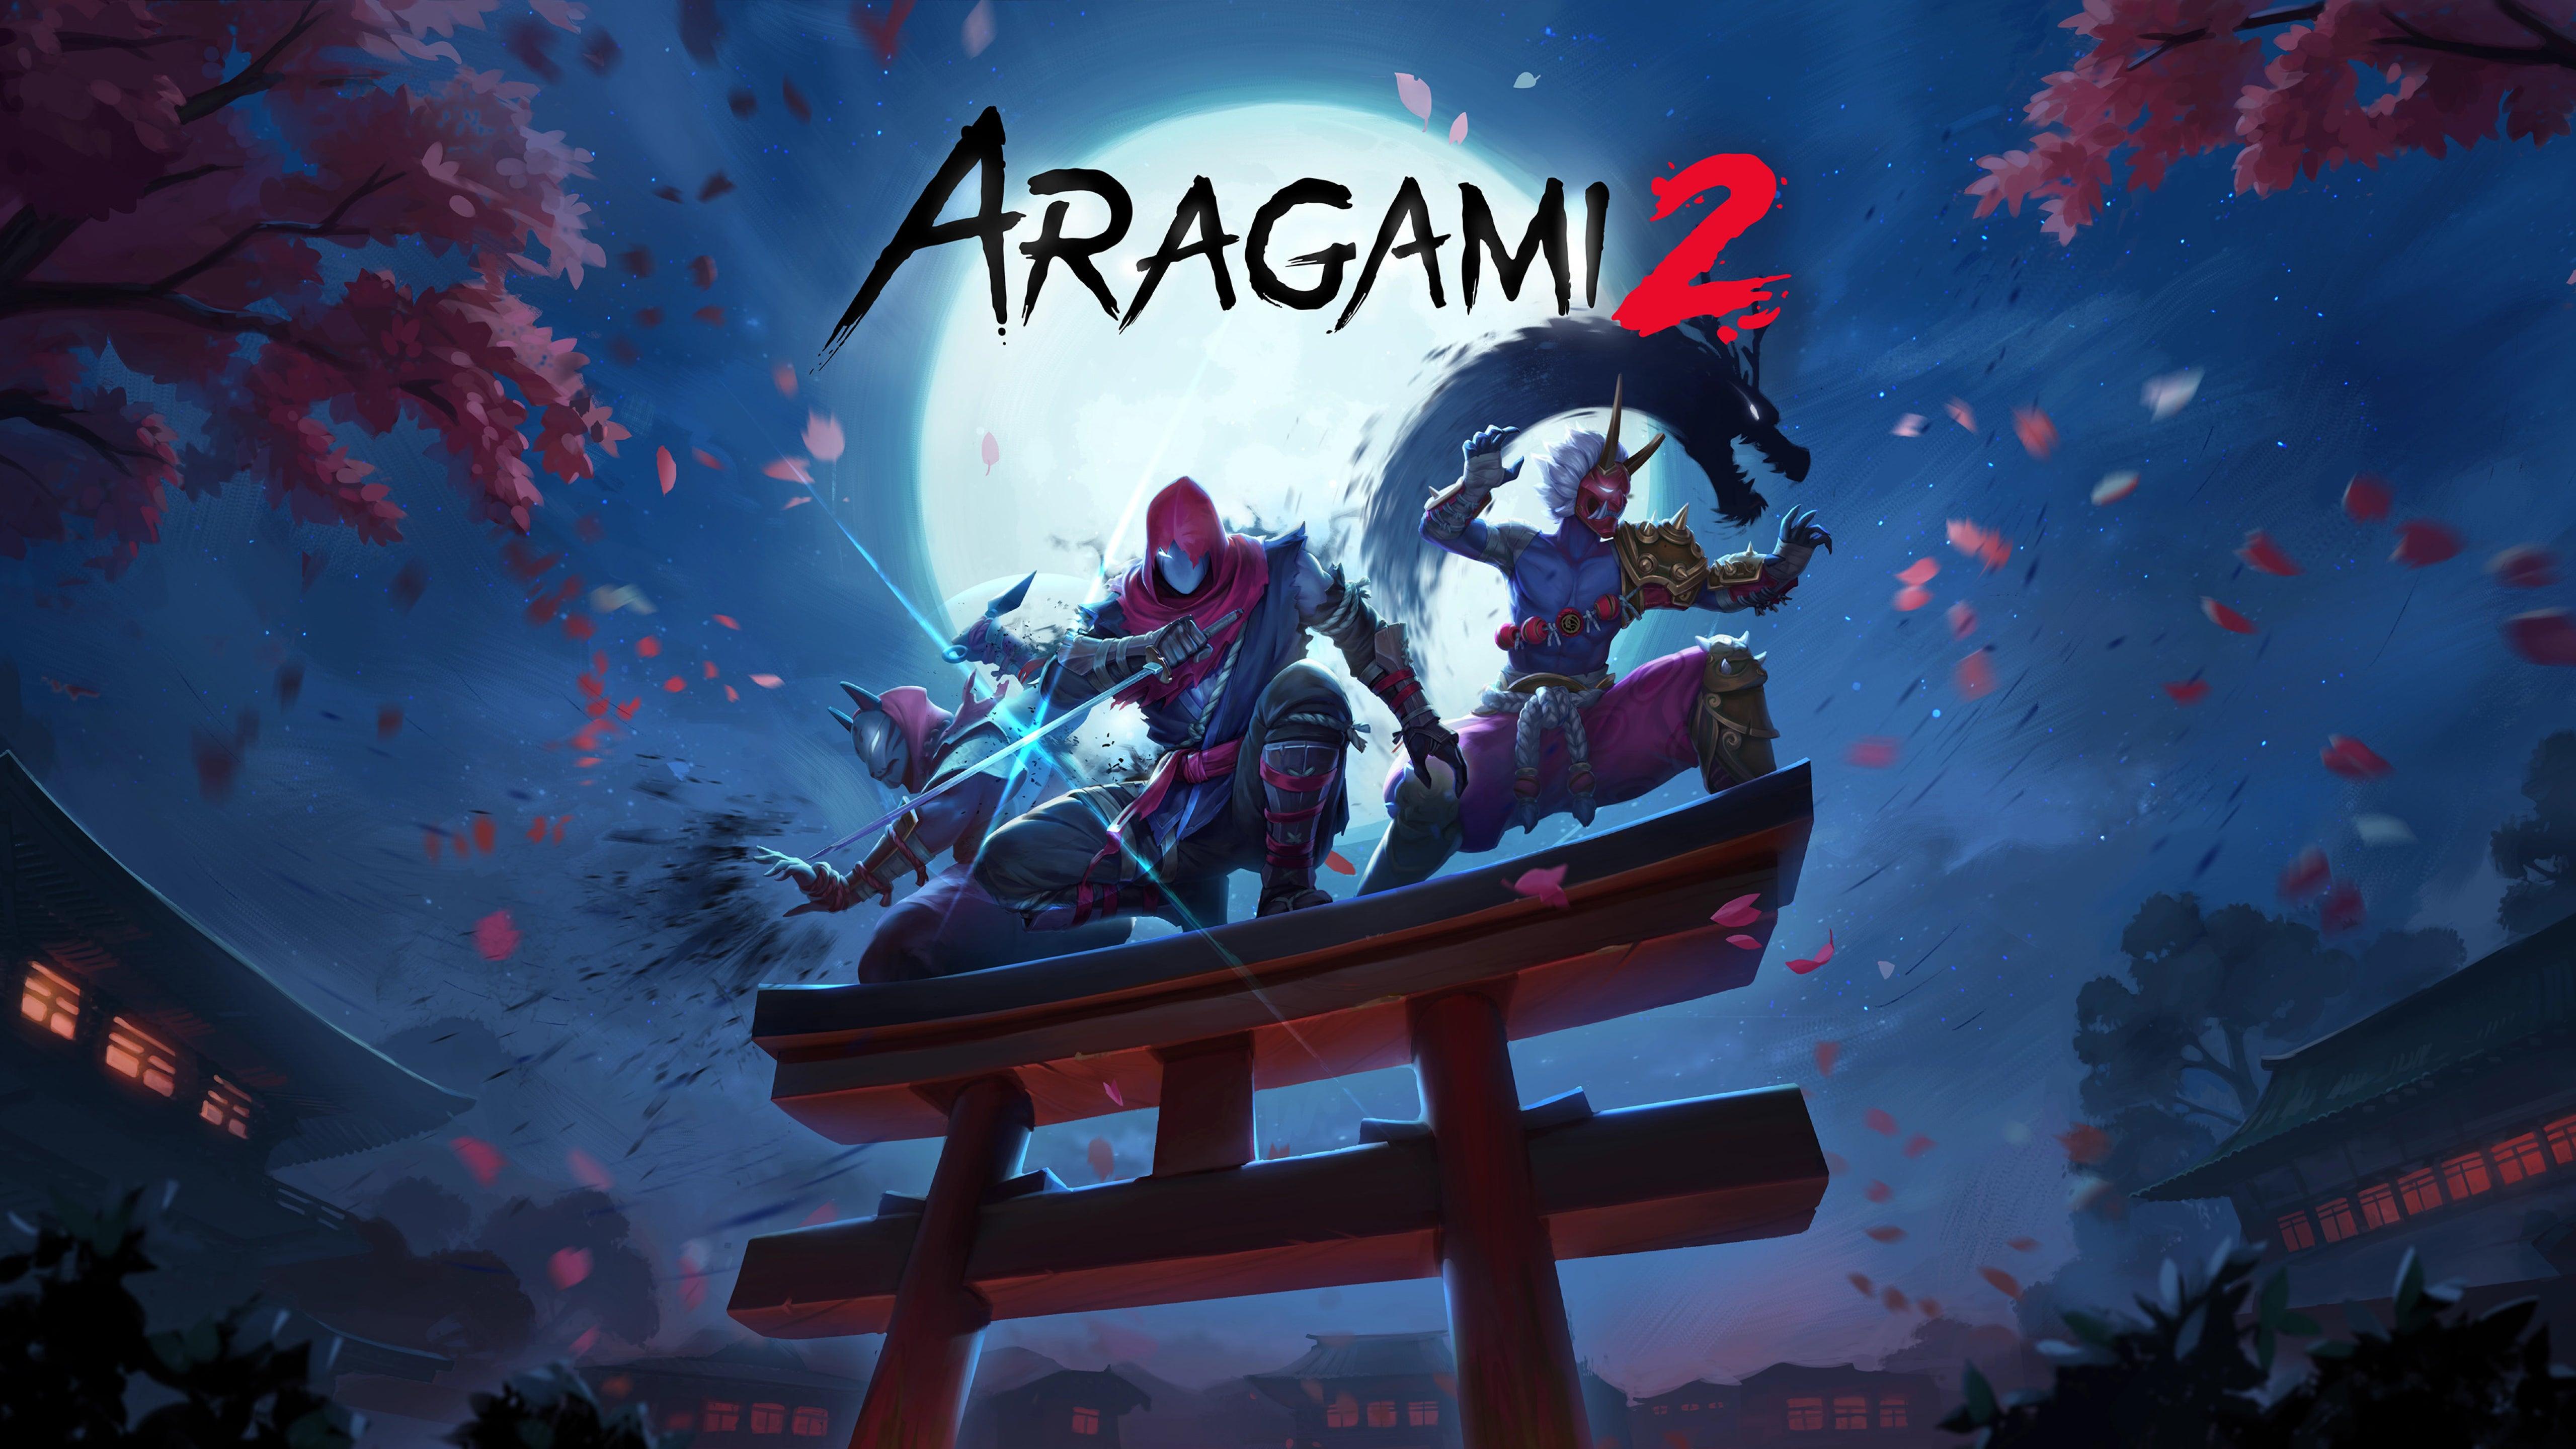 Image for Let's Play Aragami 2 - an arcadey take on ninja assassins